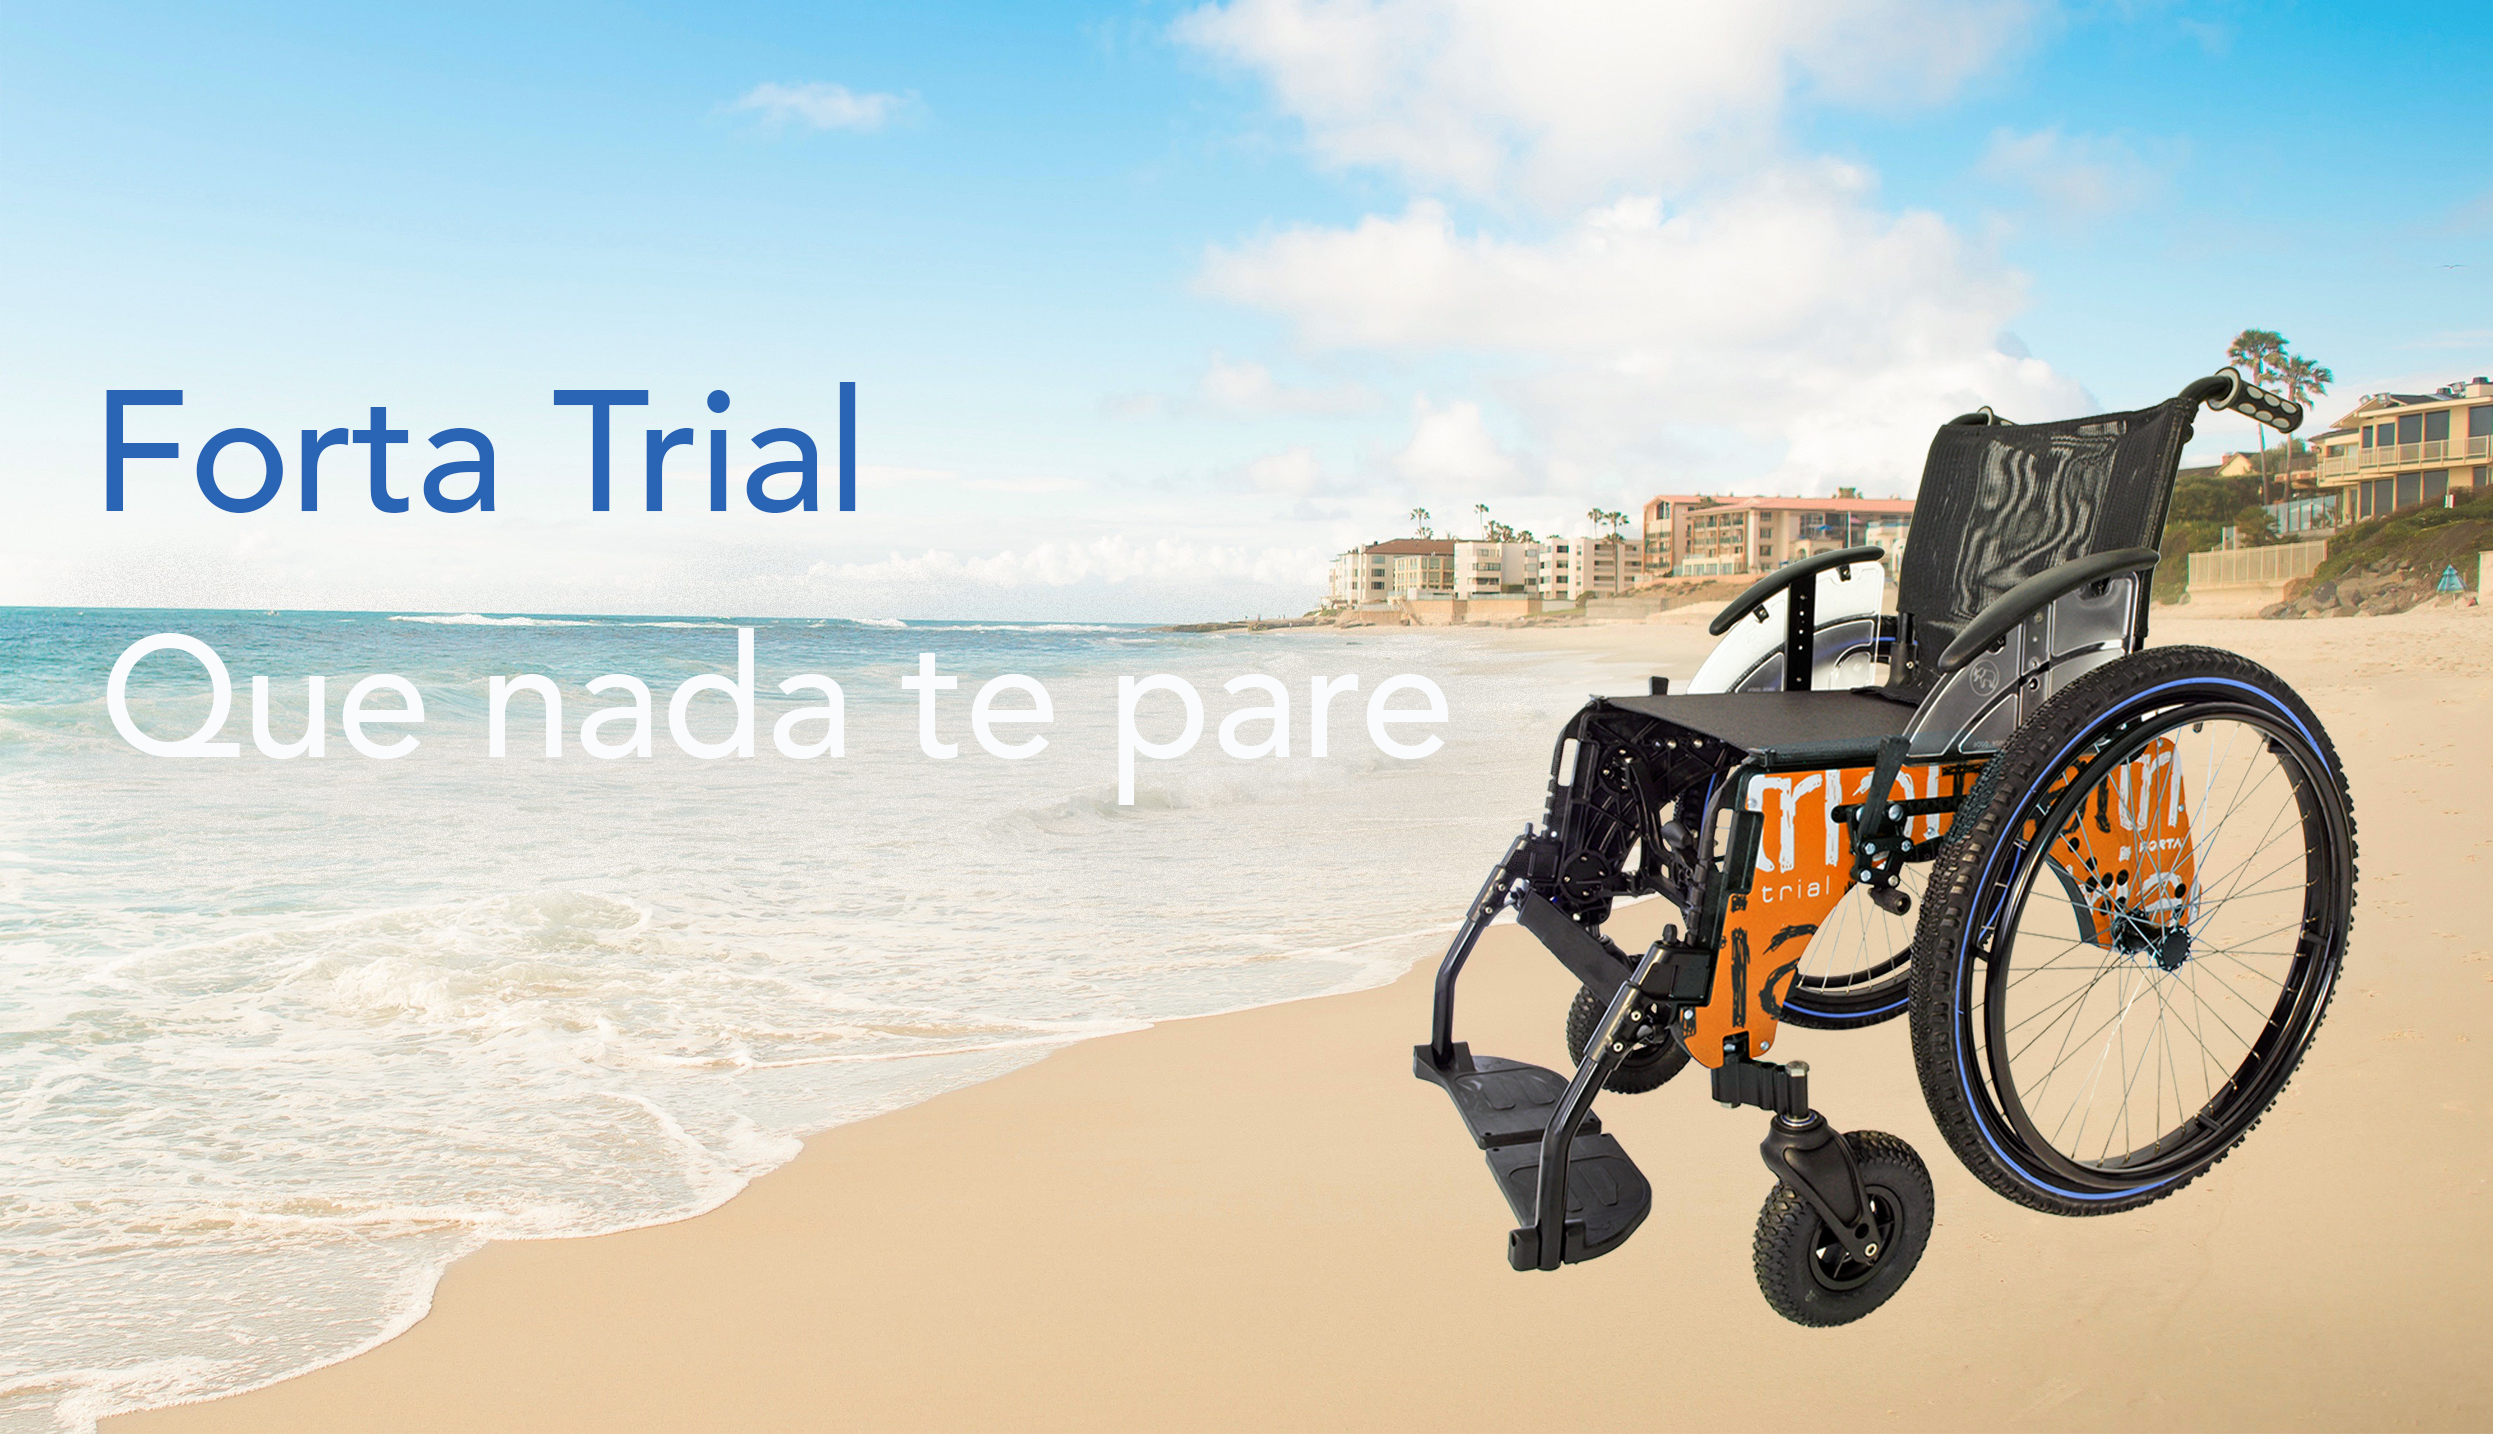 Forta Trial